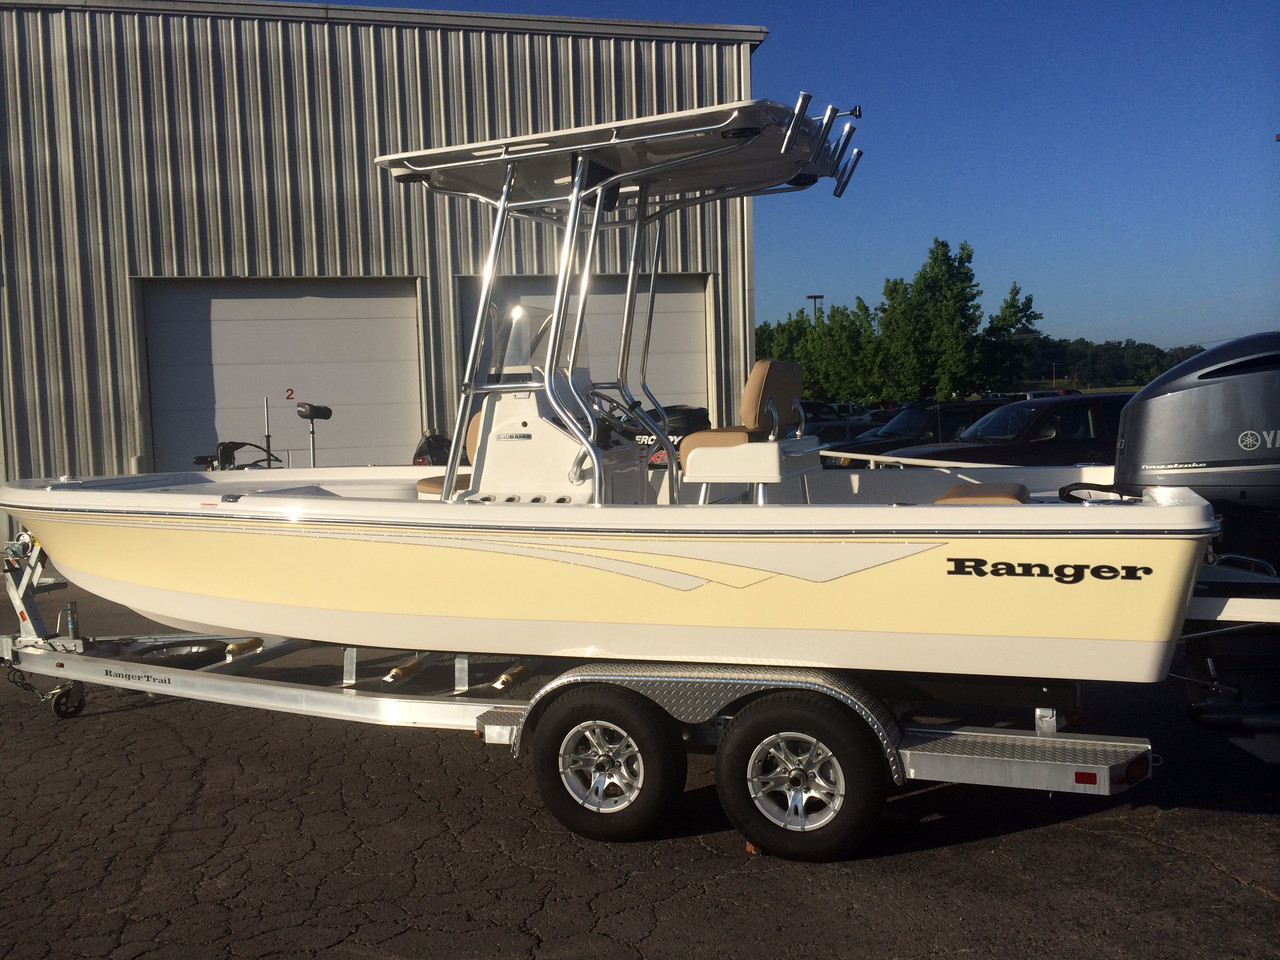 2016 new ranger 240 bahia center console fishing boat for for Center console fishing boats for sale